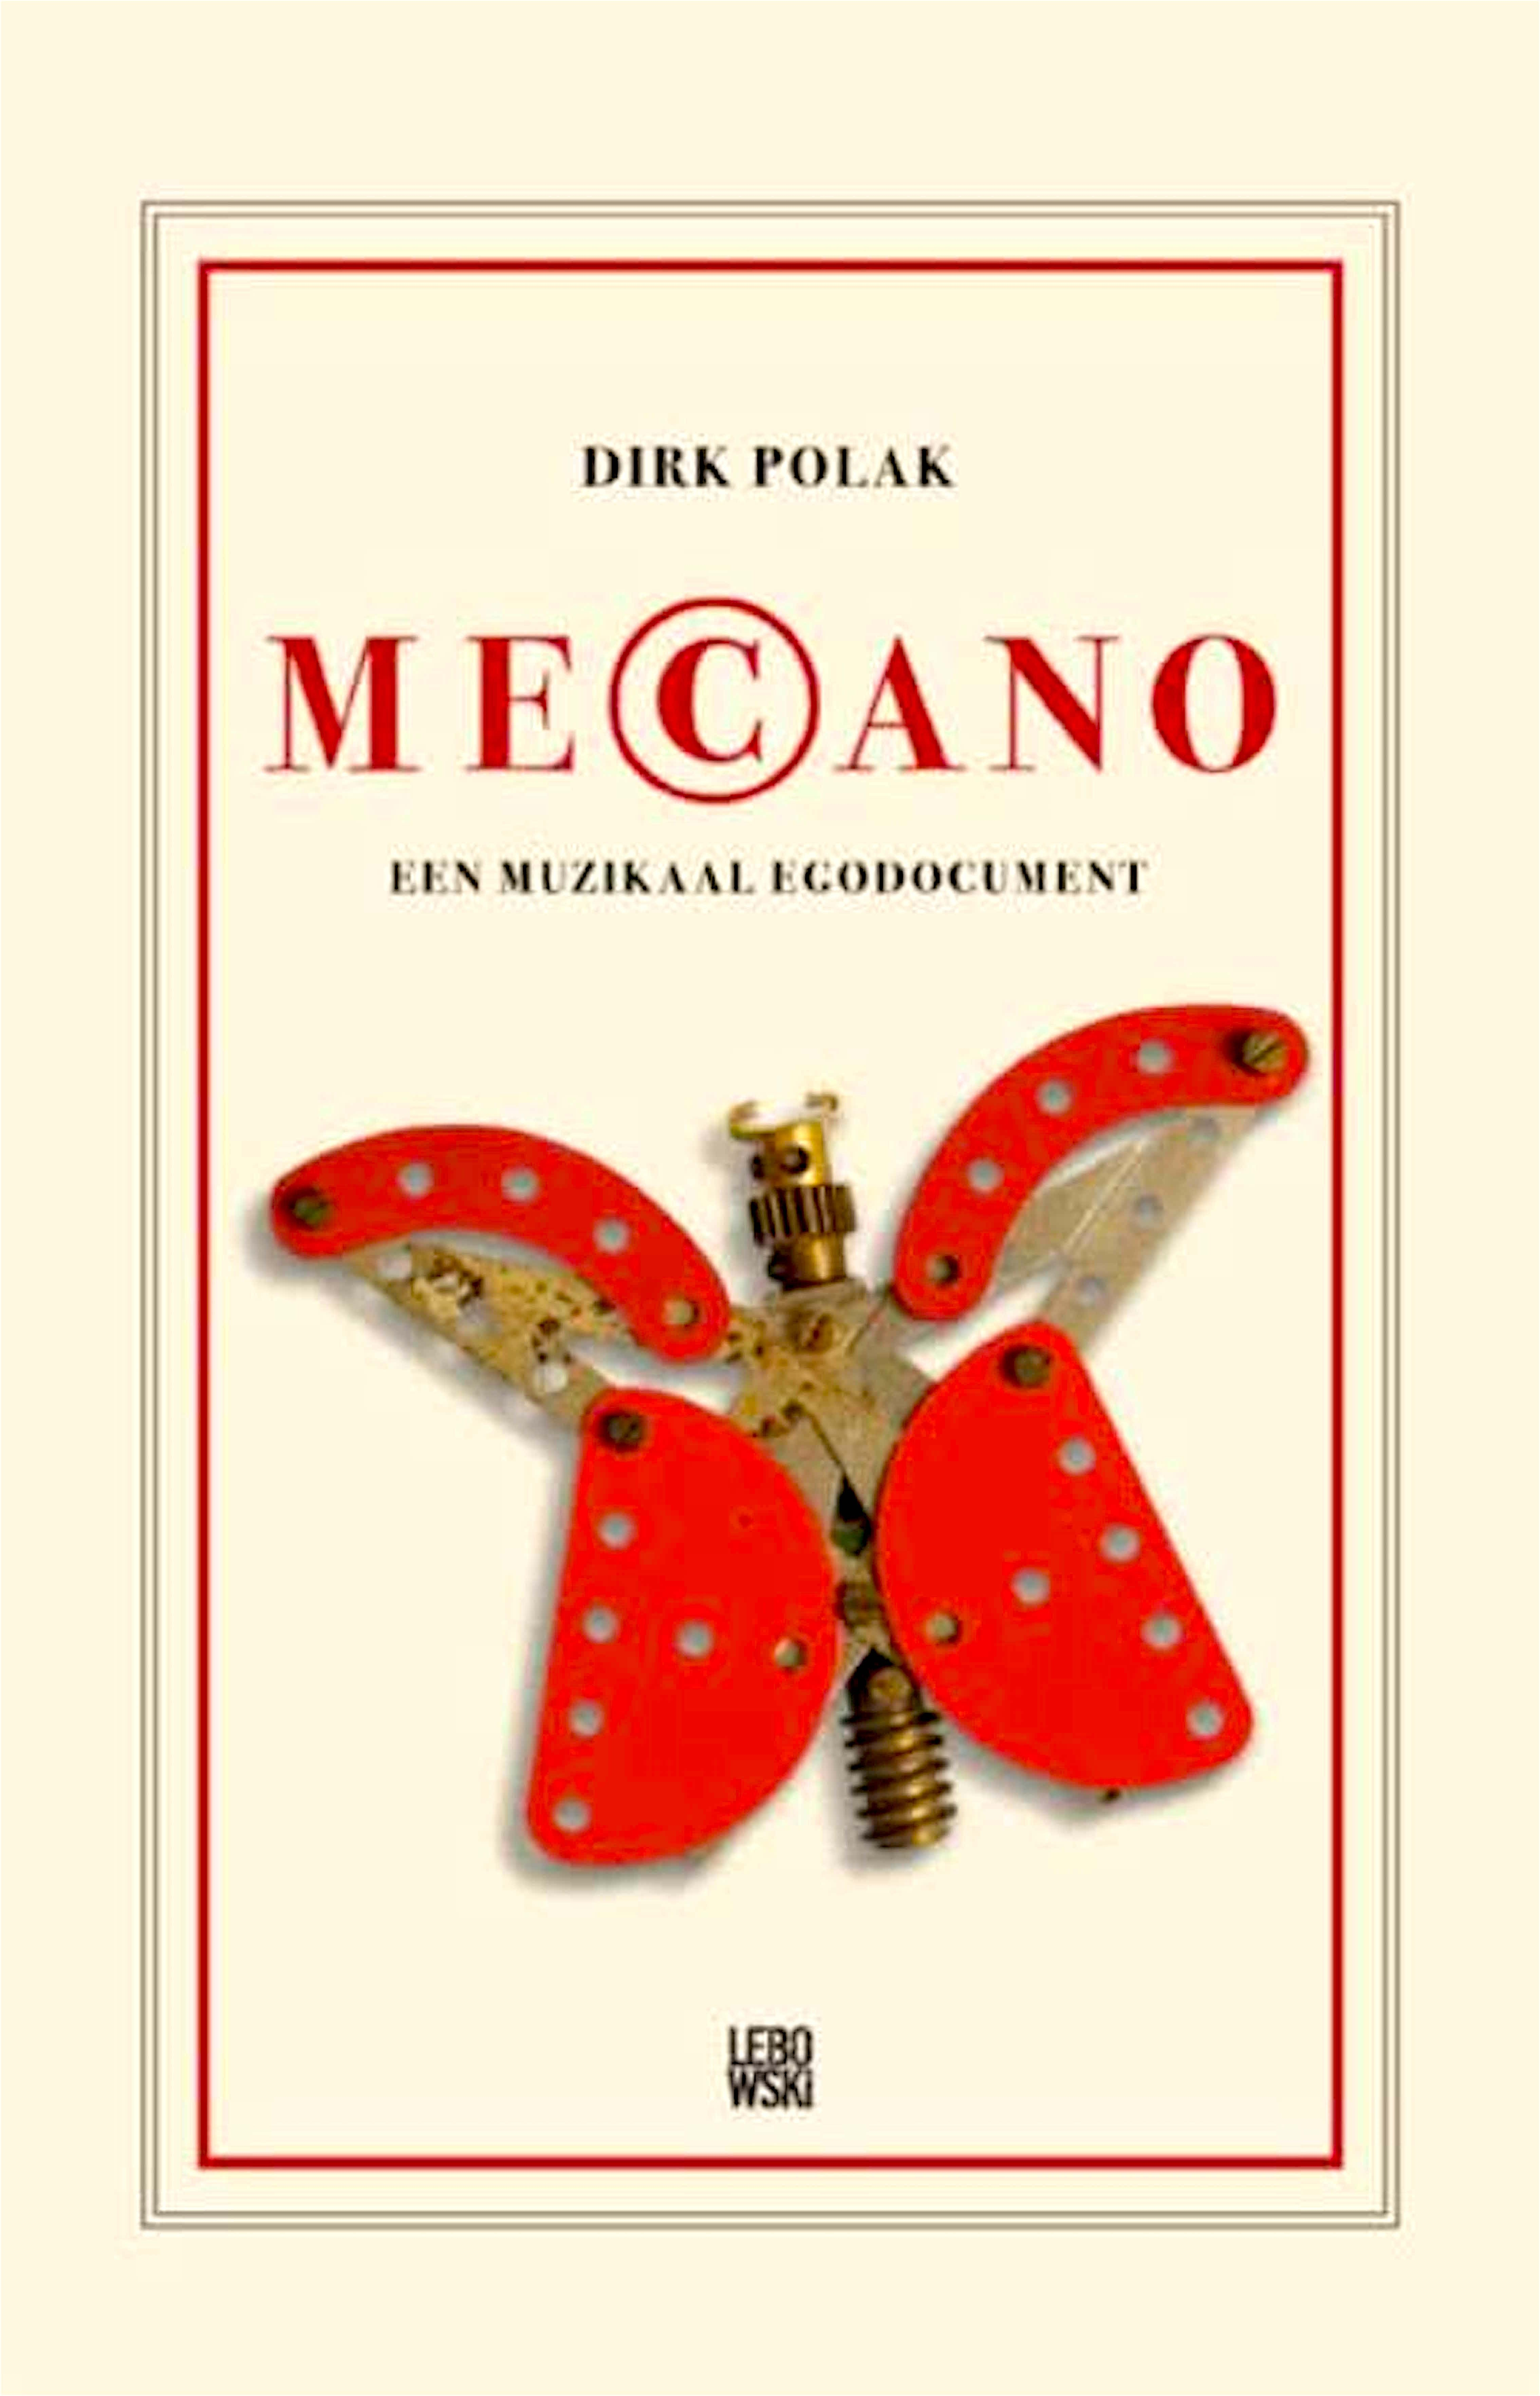 Dirk Polak – Mecano Een muzikaal egodocument